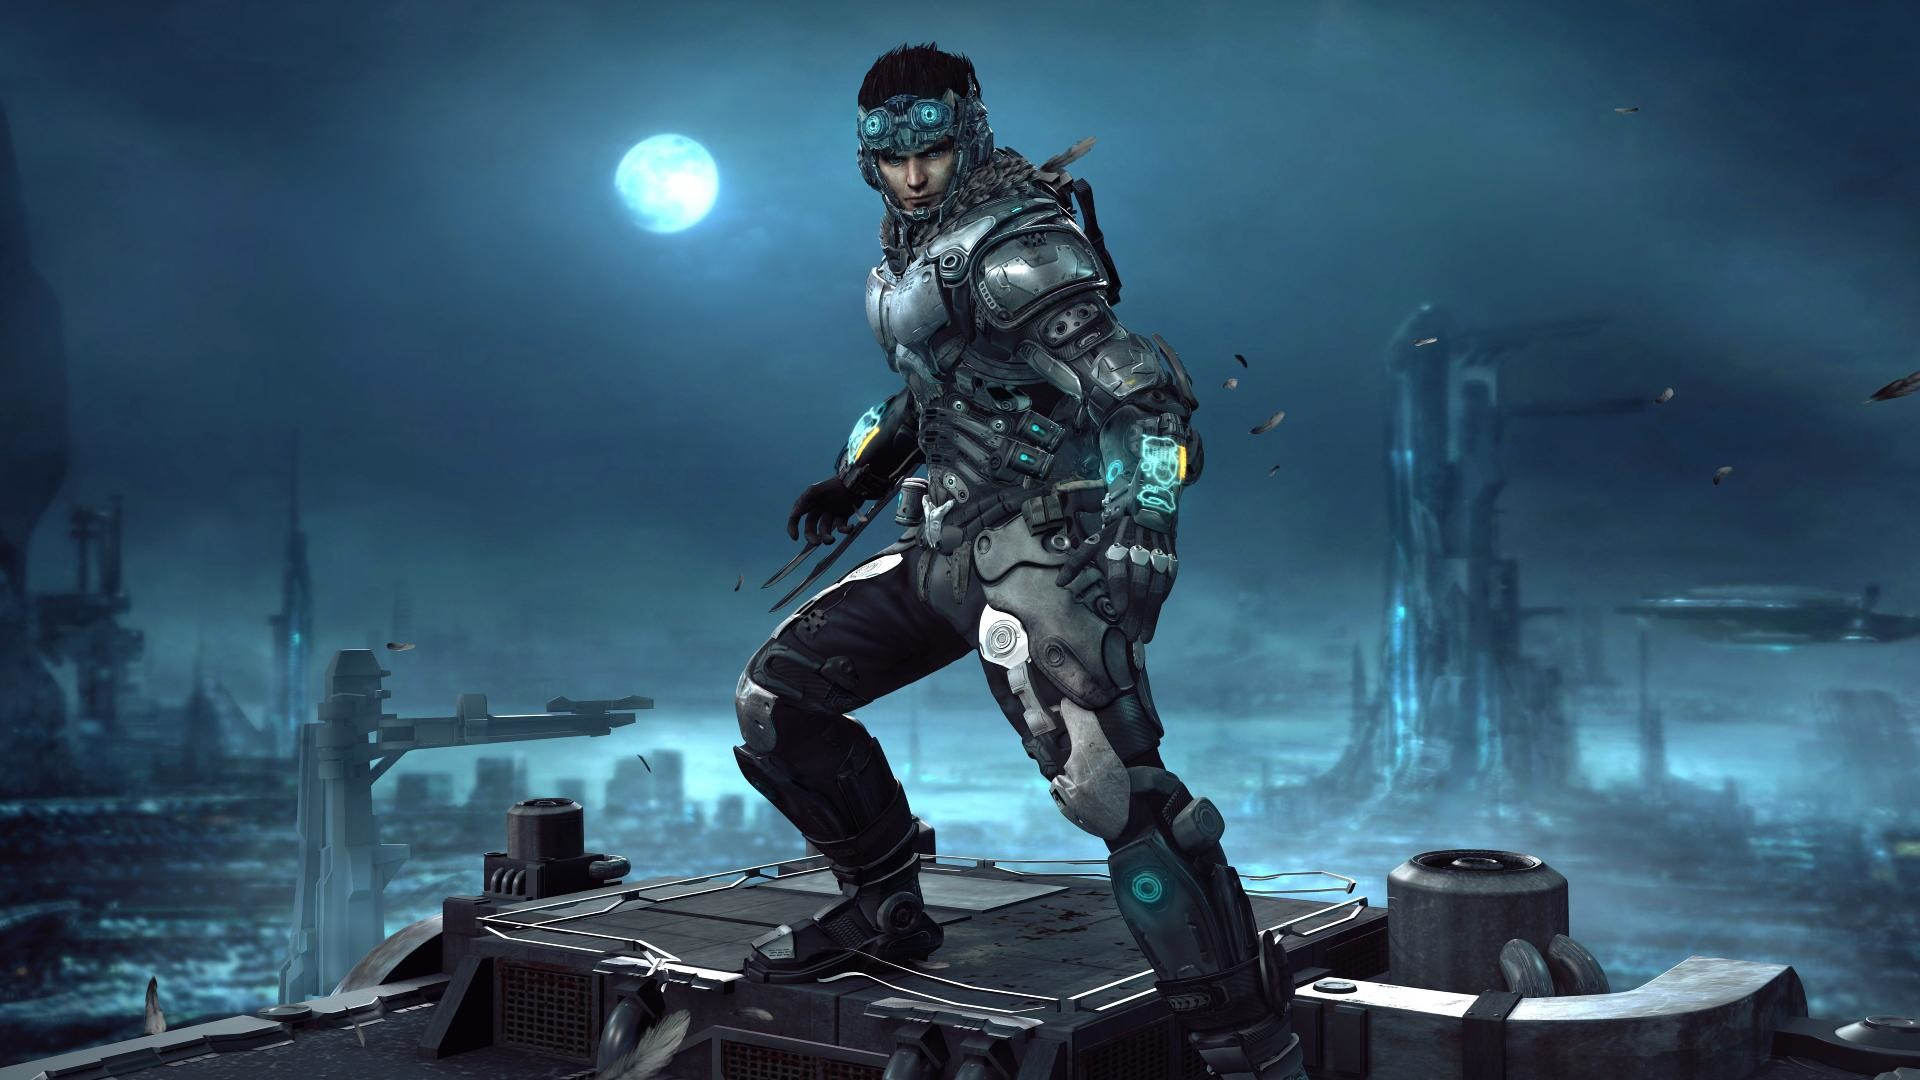 HD Cyborg warrior Wallpaper